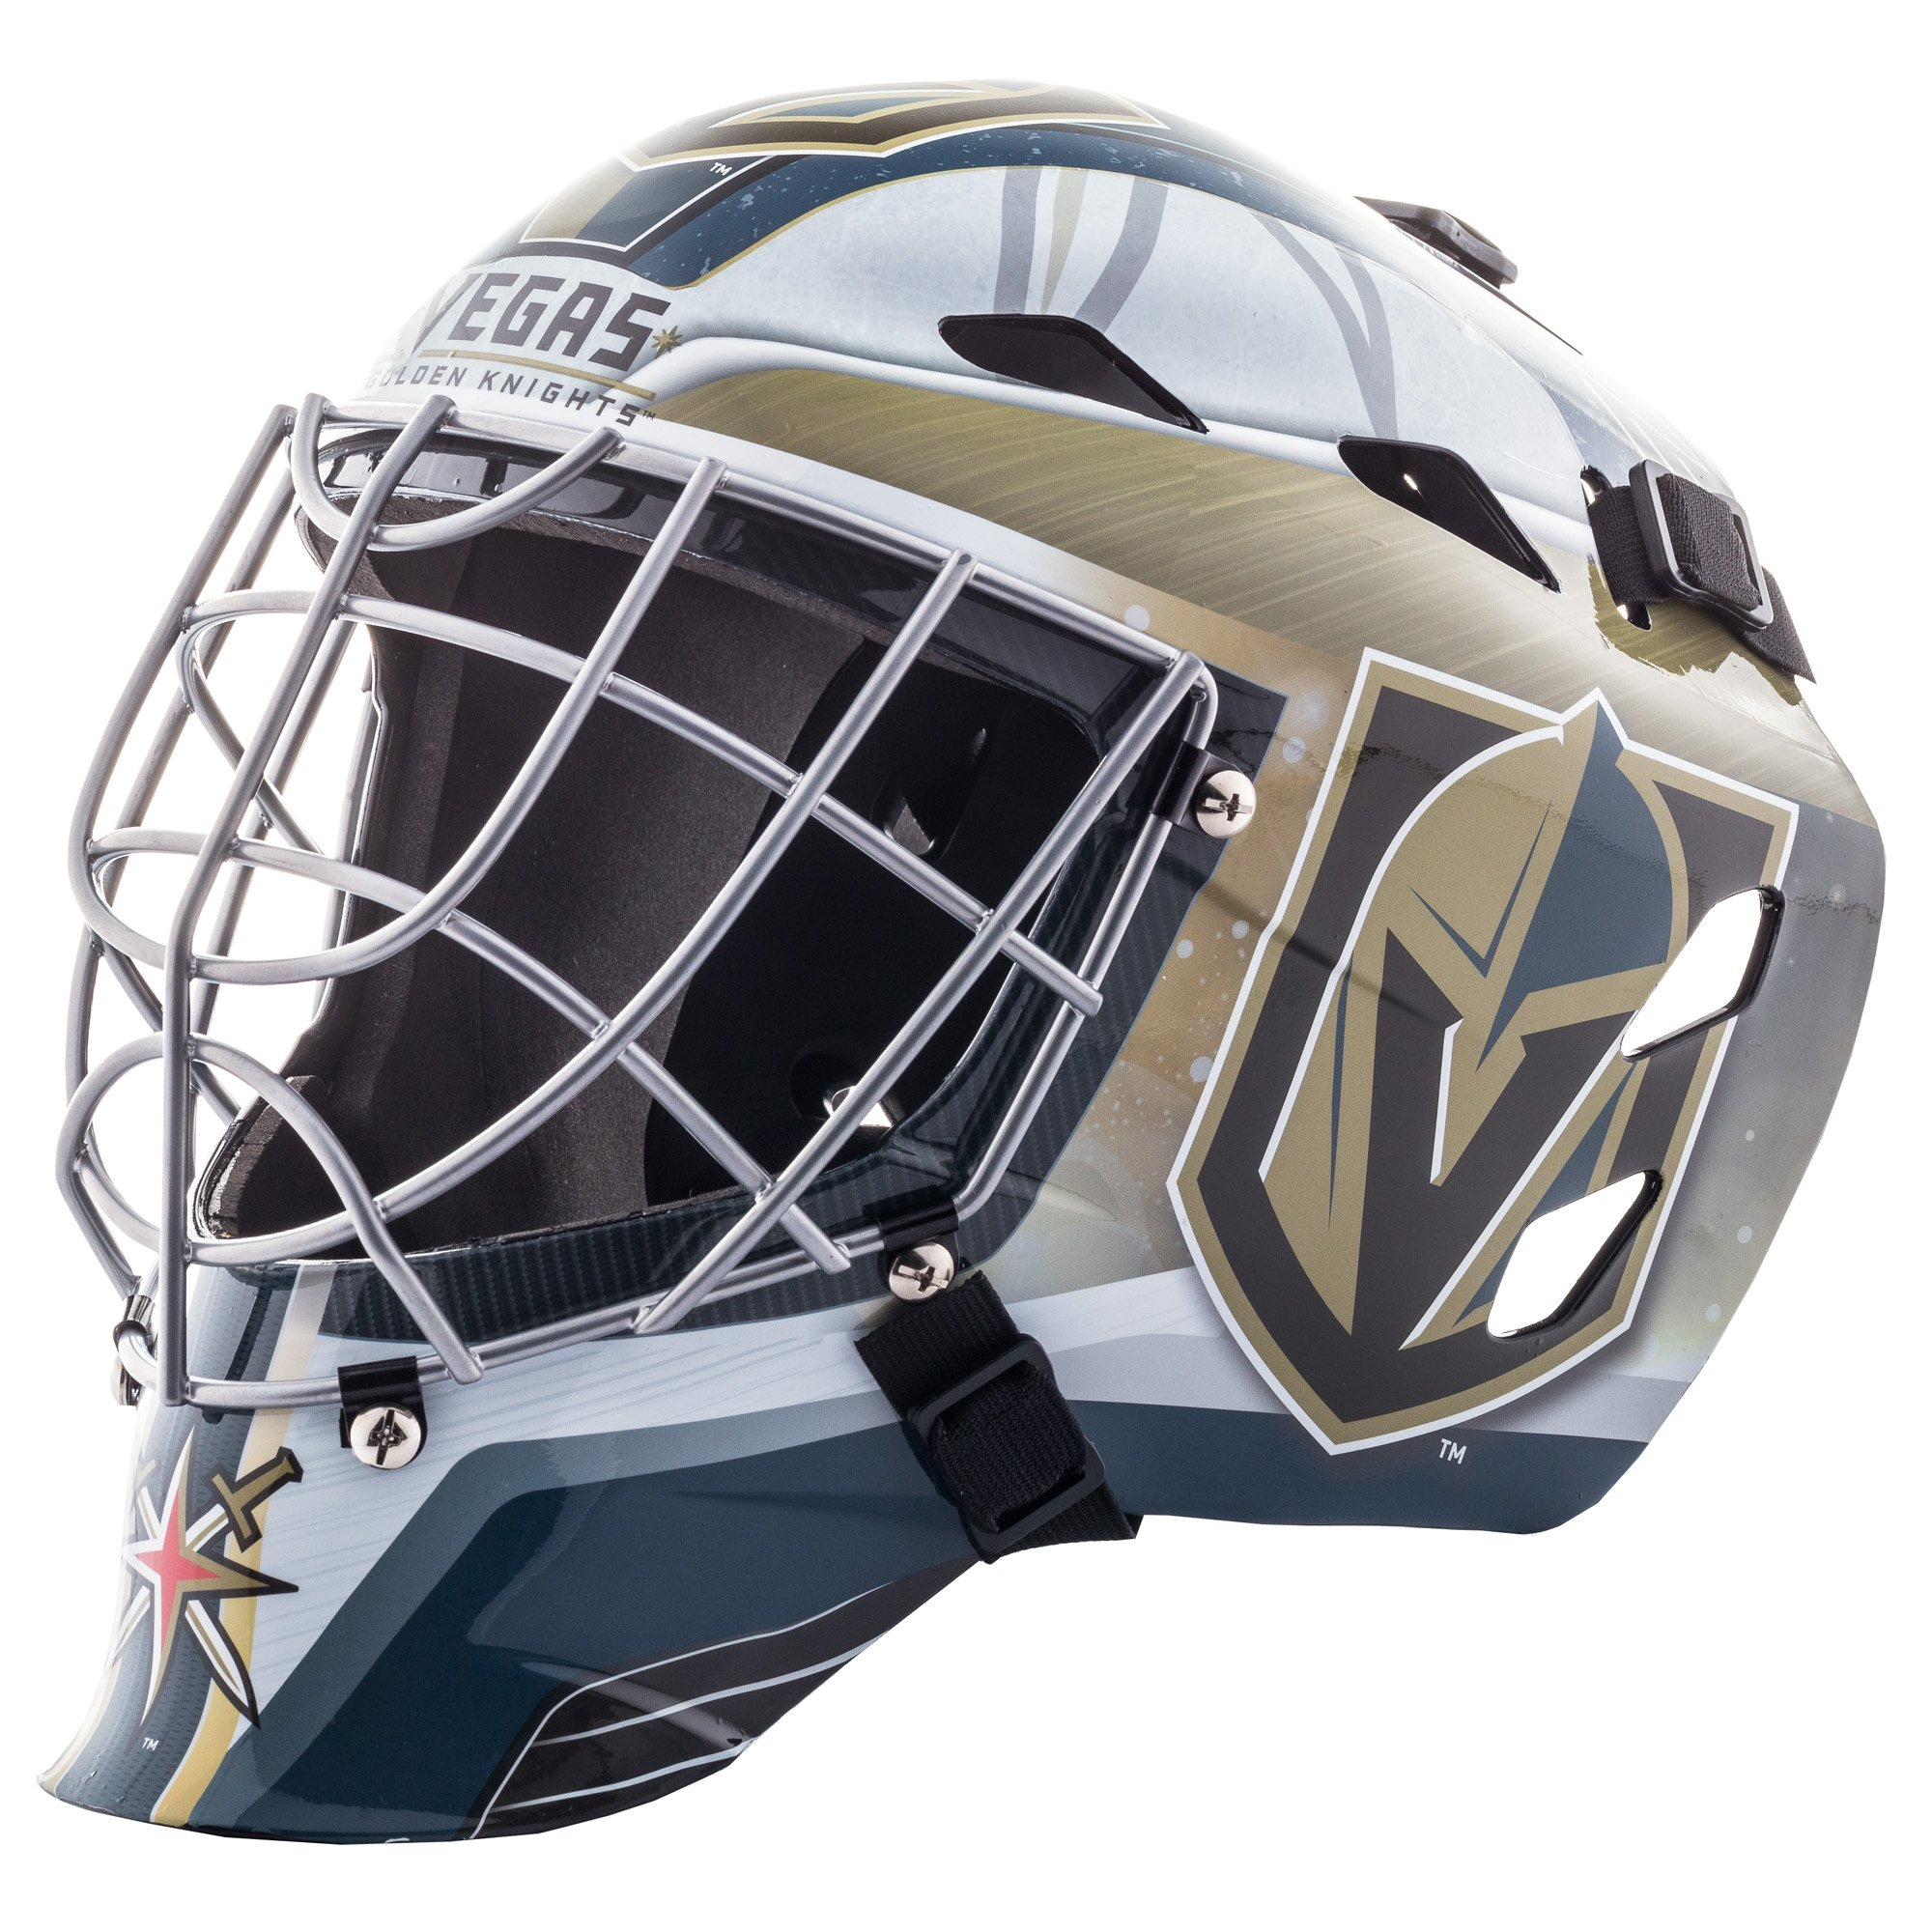 55b16863339 Franklin Sports GFM 1500 NHL Team Goalie Face Mask — Street Hockey Mask  Modeled After U.S.